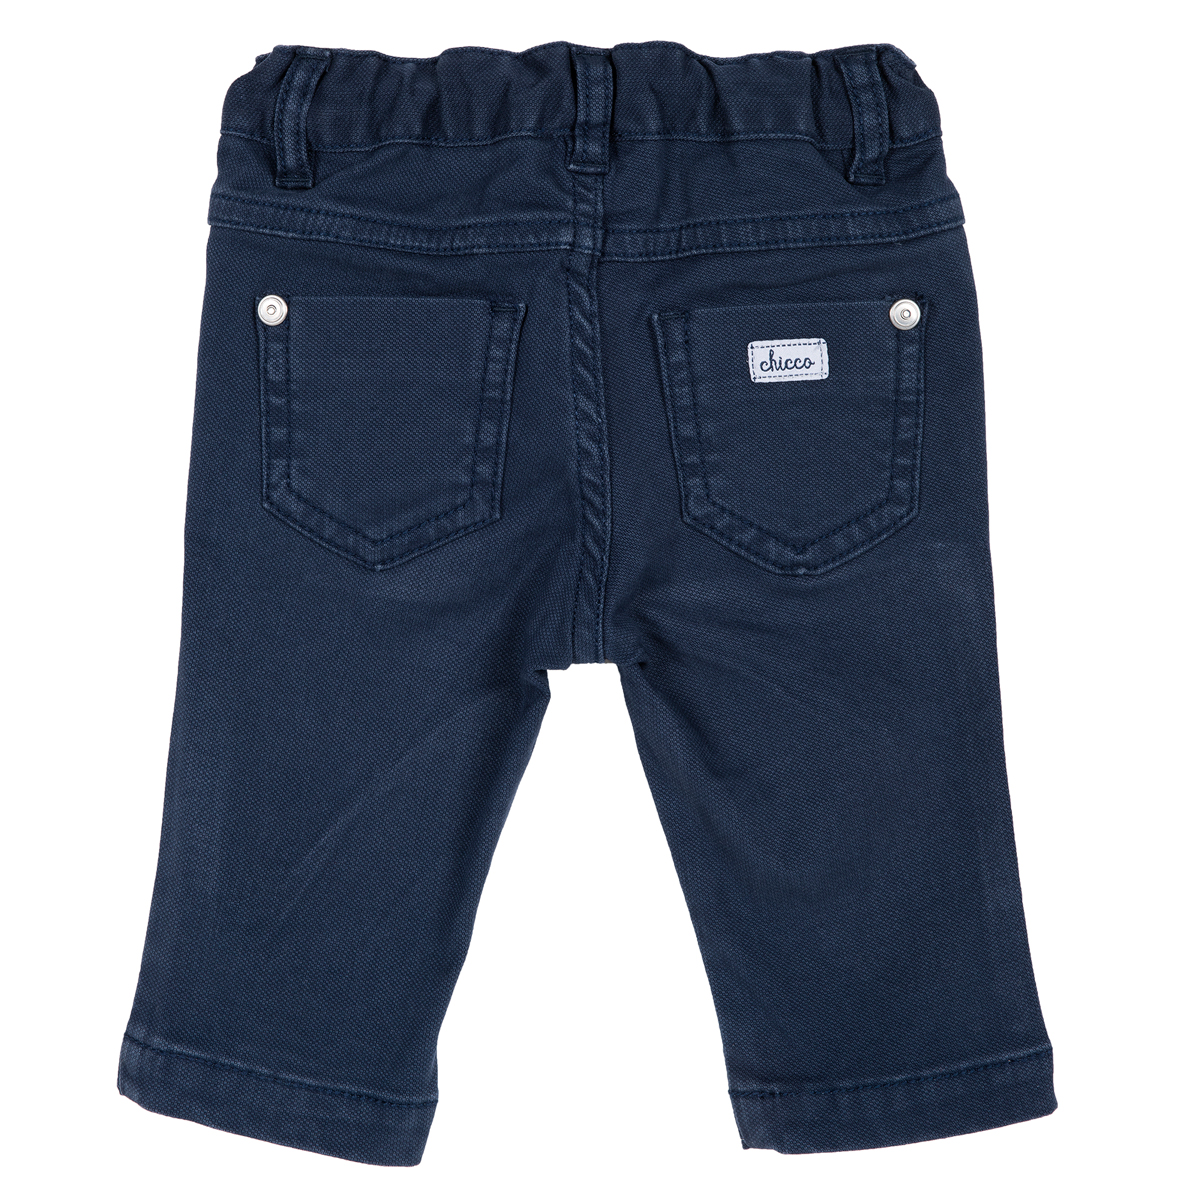 Chicco Pantalon lung Chicco albastru inchis 74